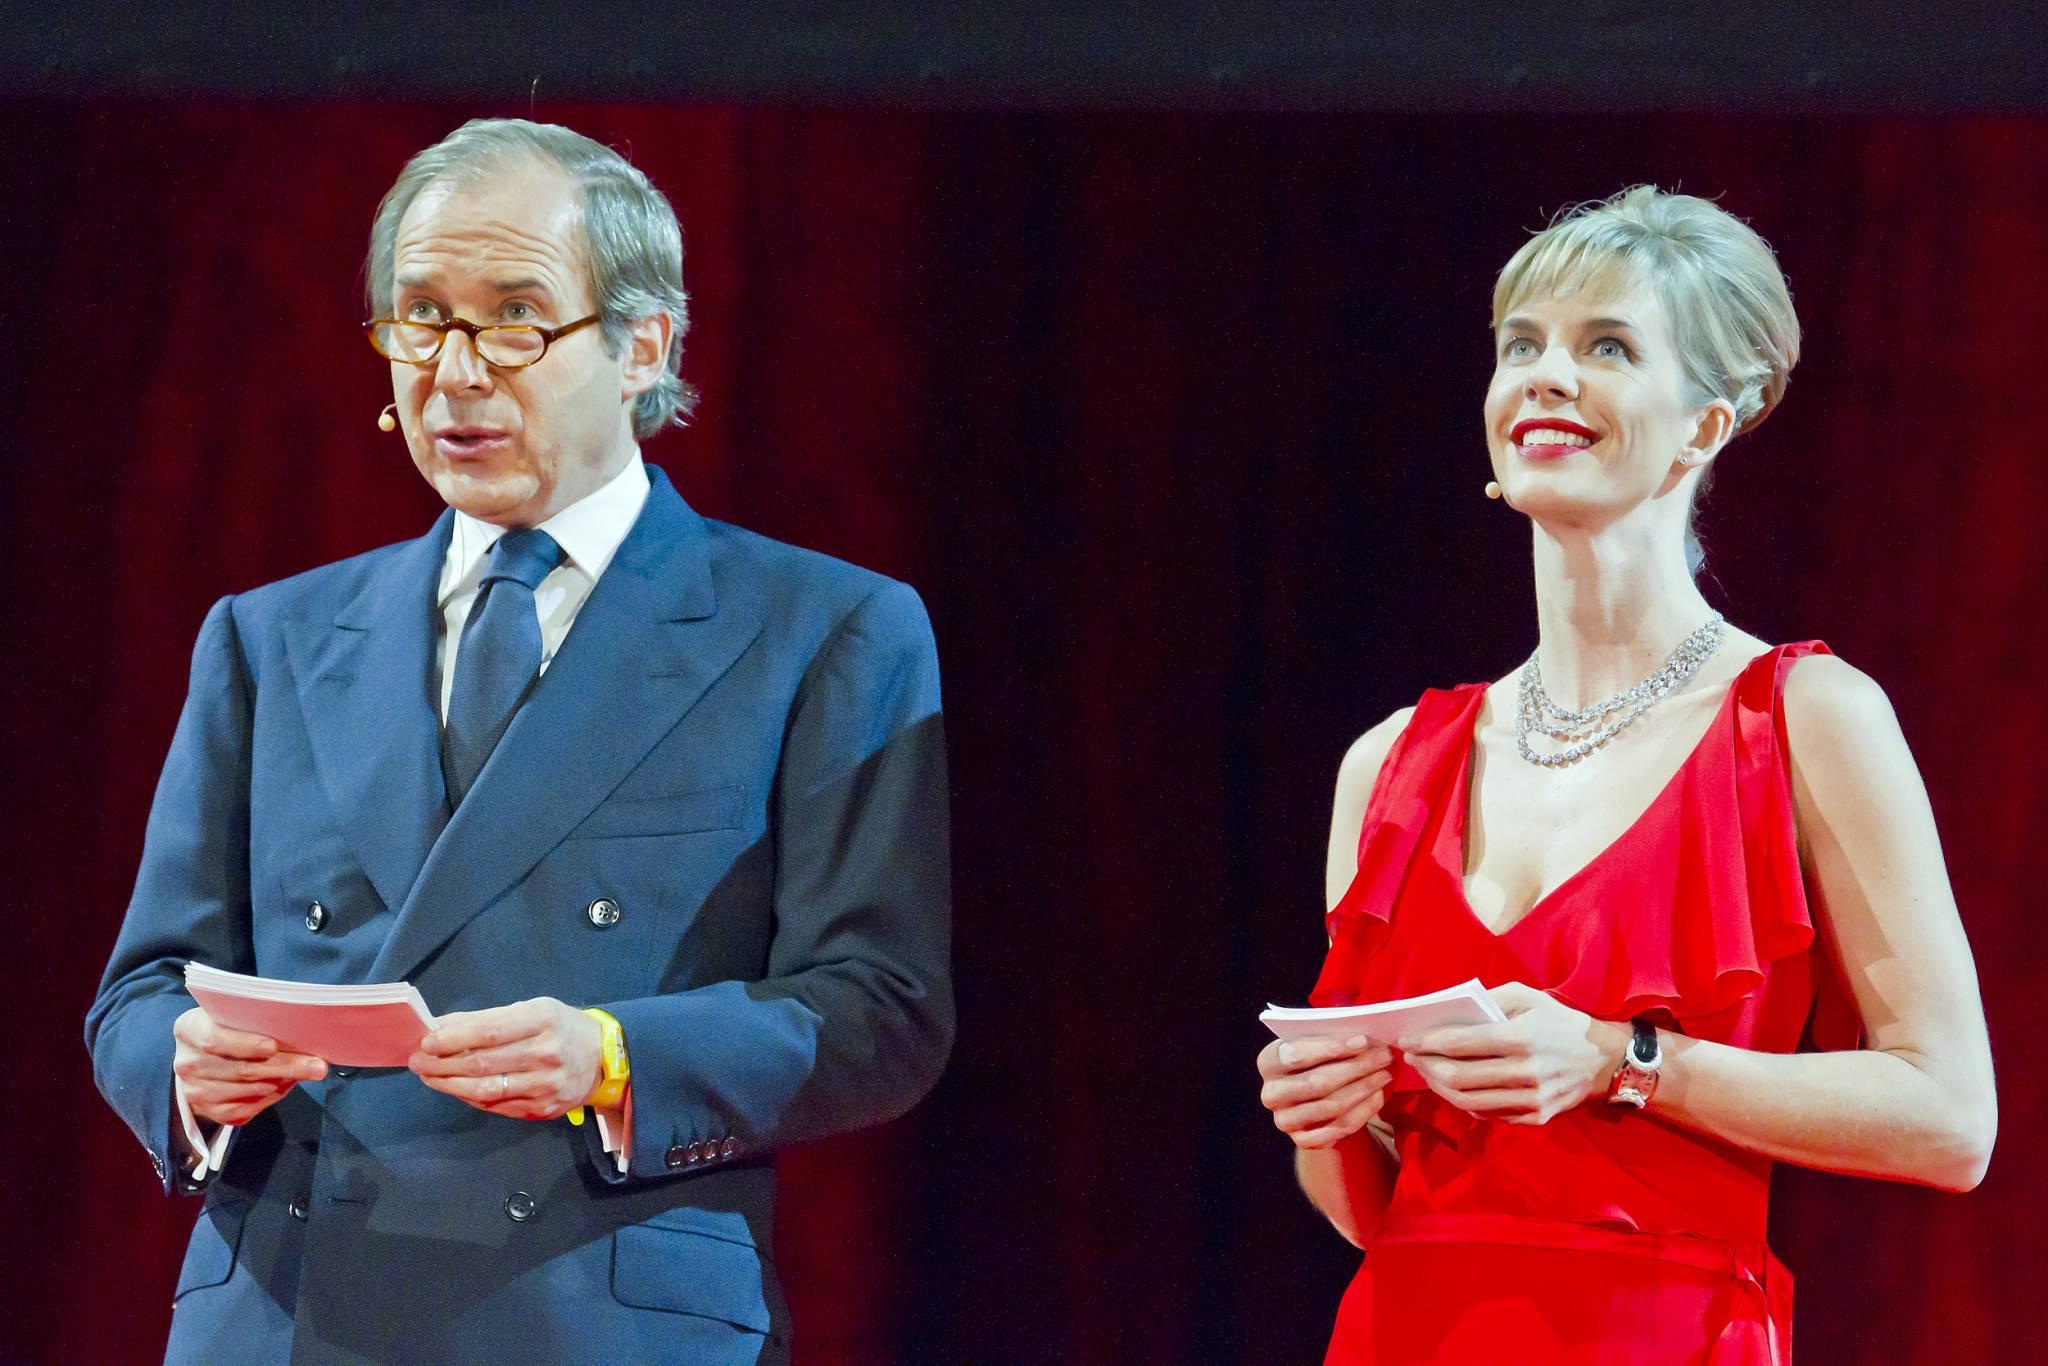 Simon de Pury and Natacha Wenger co-host the 2011 Awards ceremony